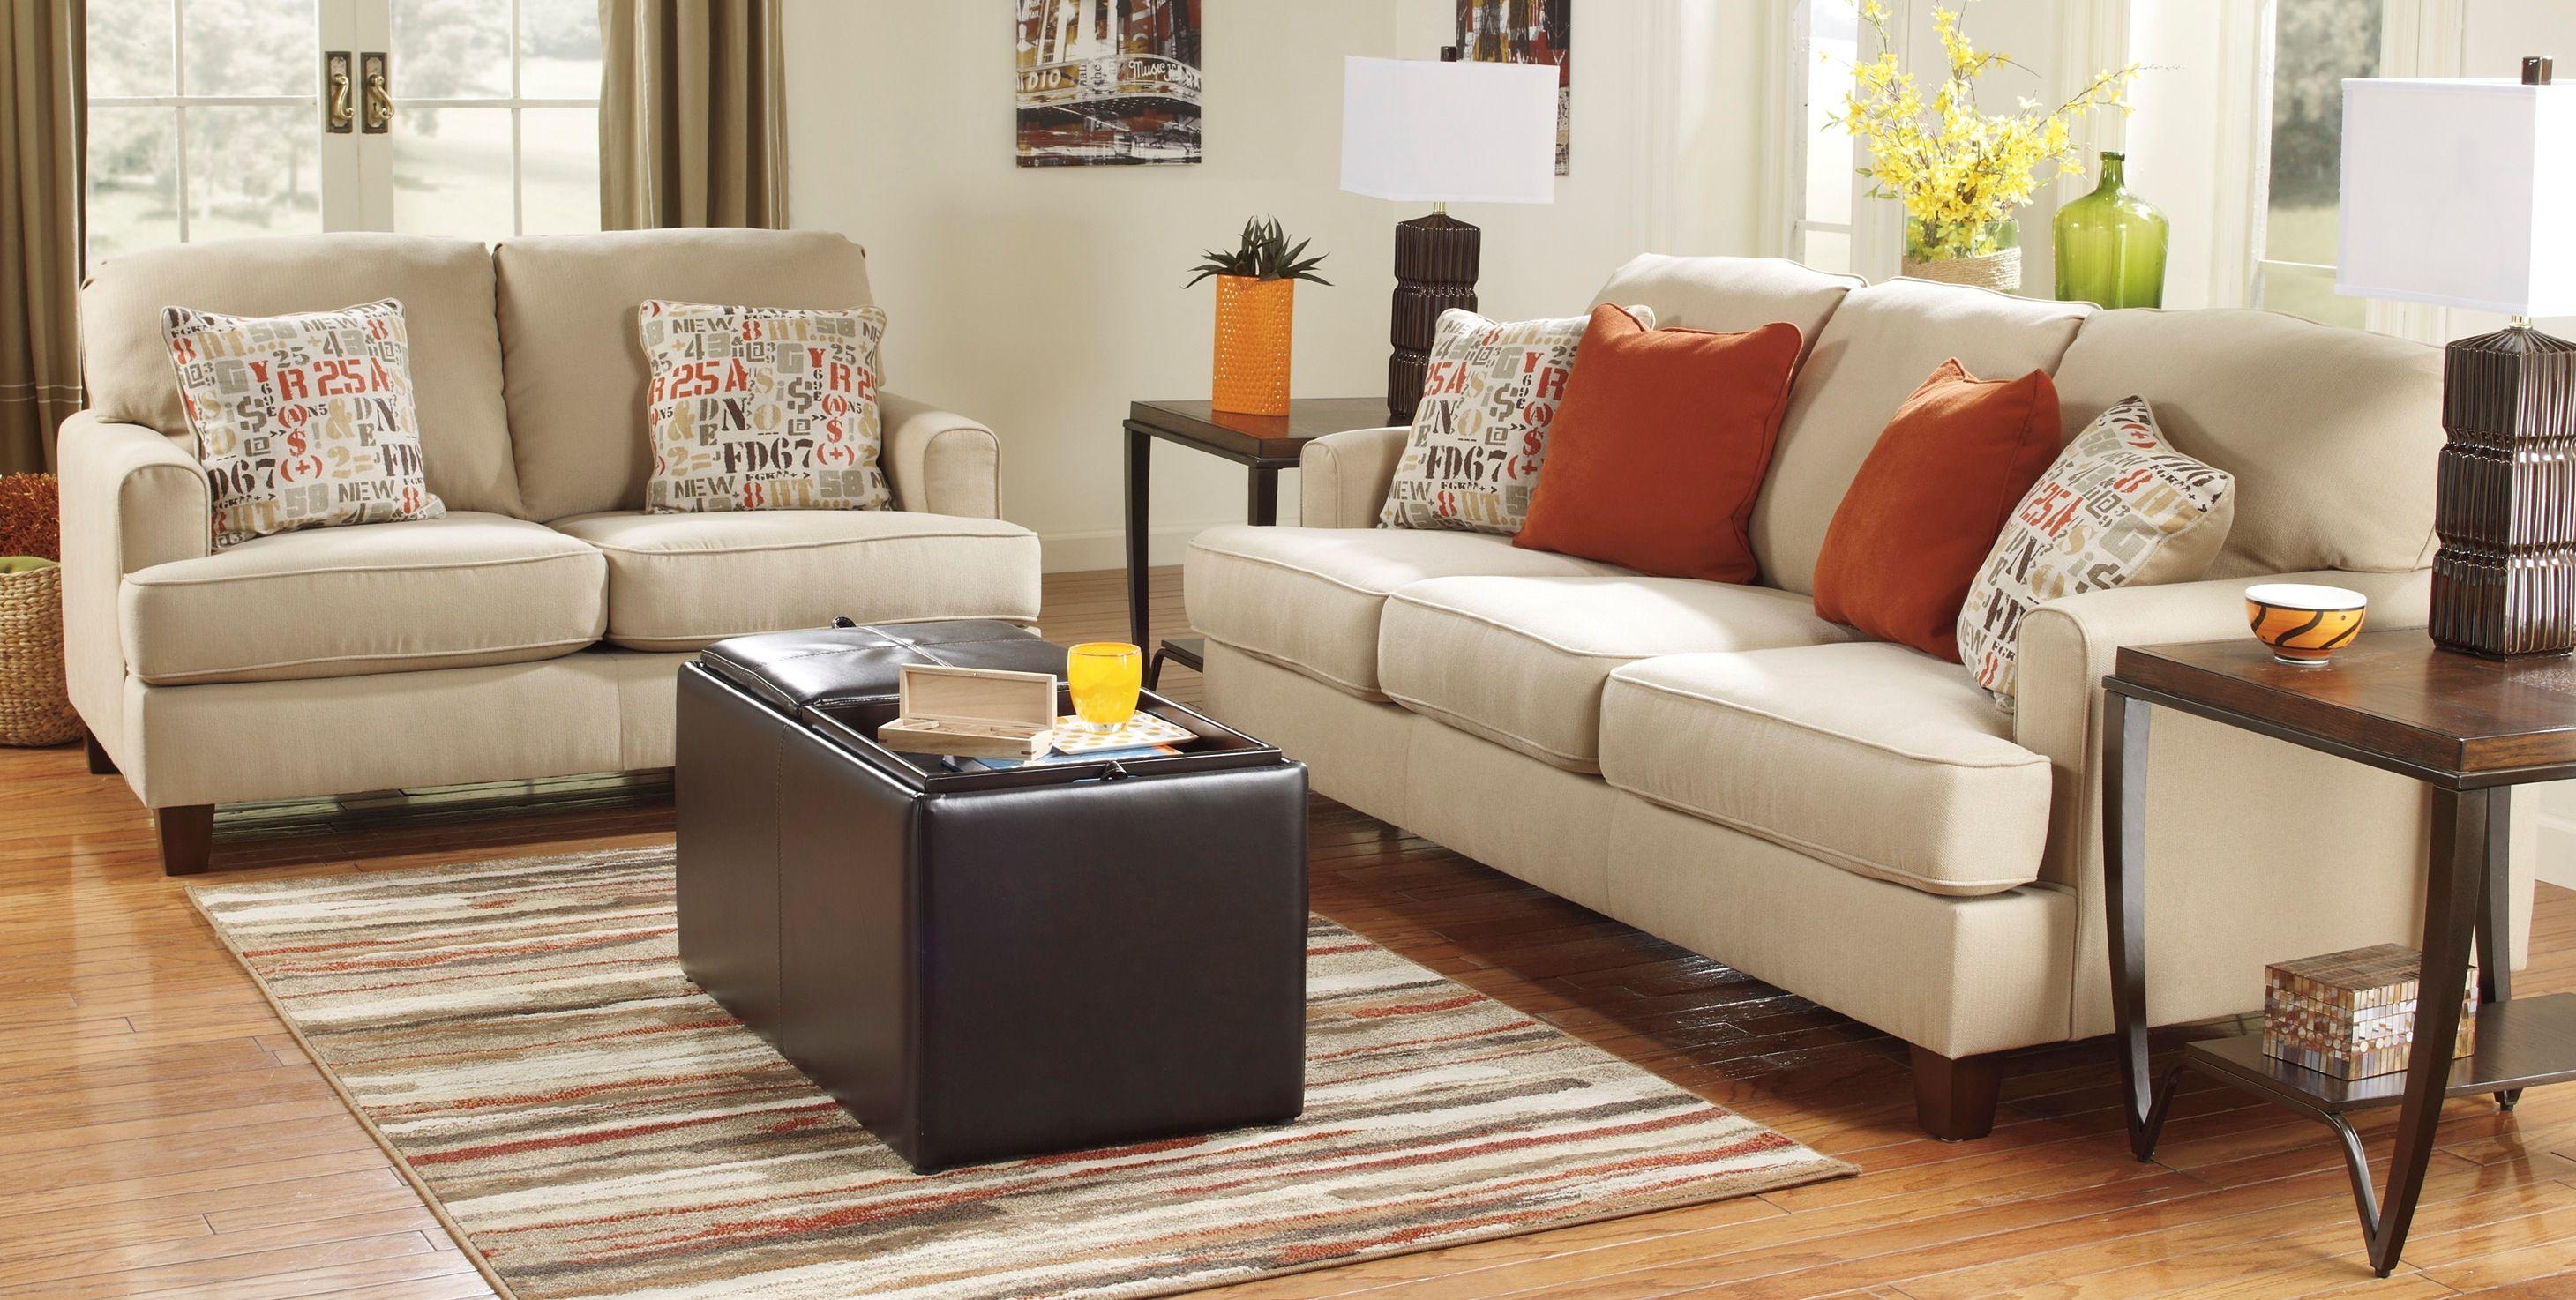 Living Room Decor On A Budget Deshan Sofa By Ashley Furniture At Kensington Furn Living Room Decor On A Budget Living Room Sets Furniture Stylish Dining Room